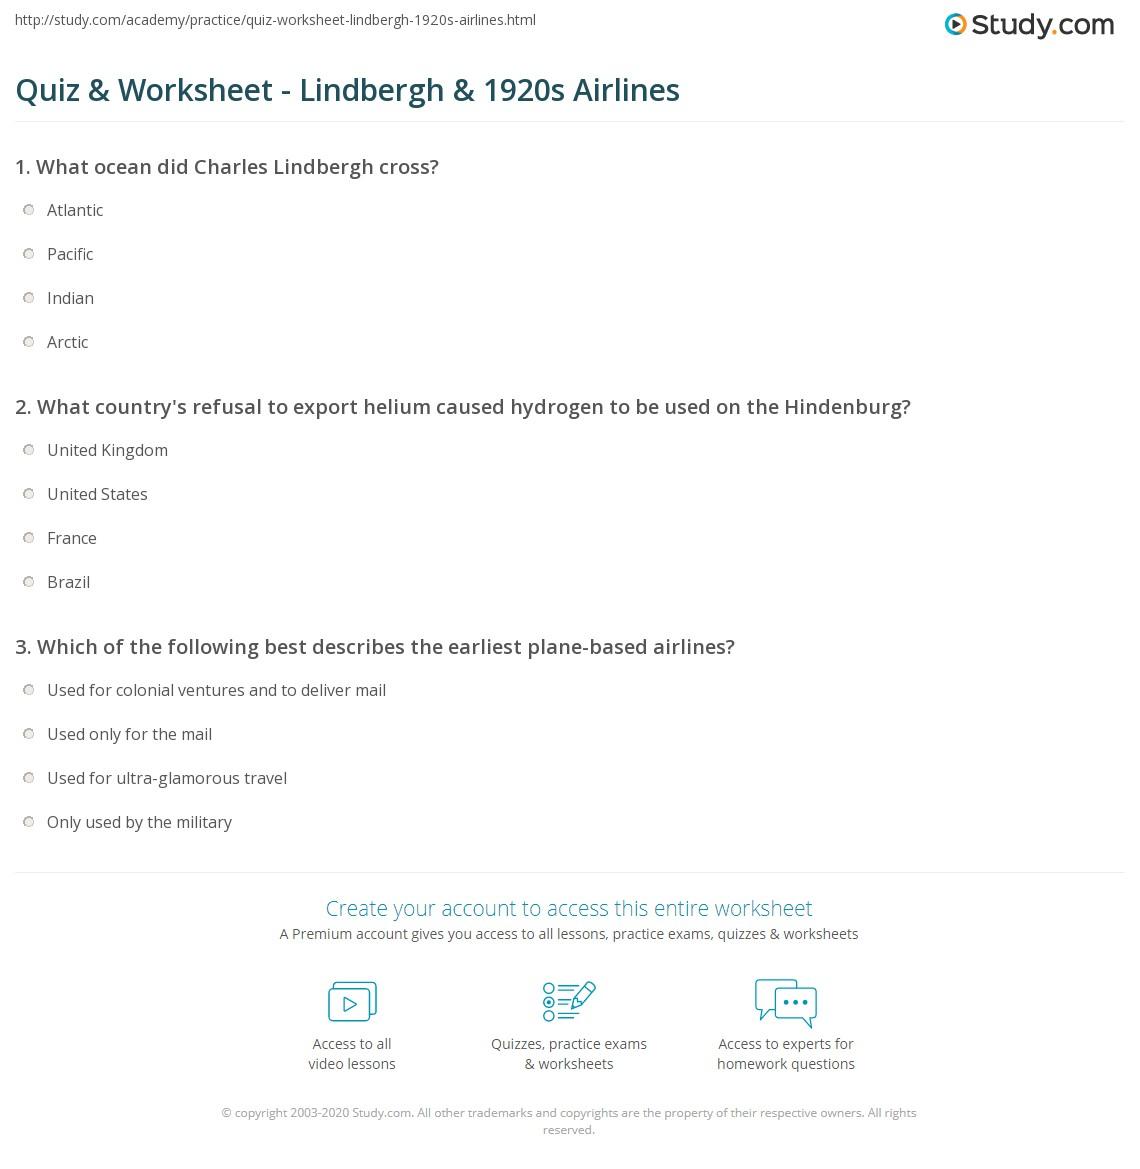 hindenburg comprehension question